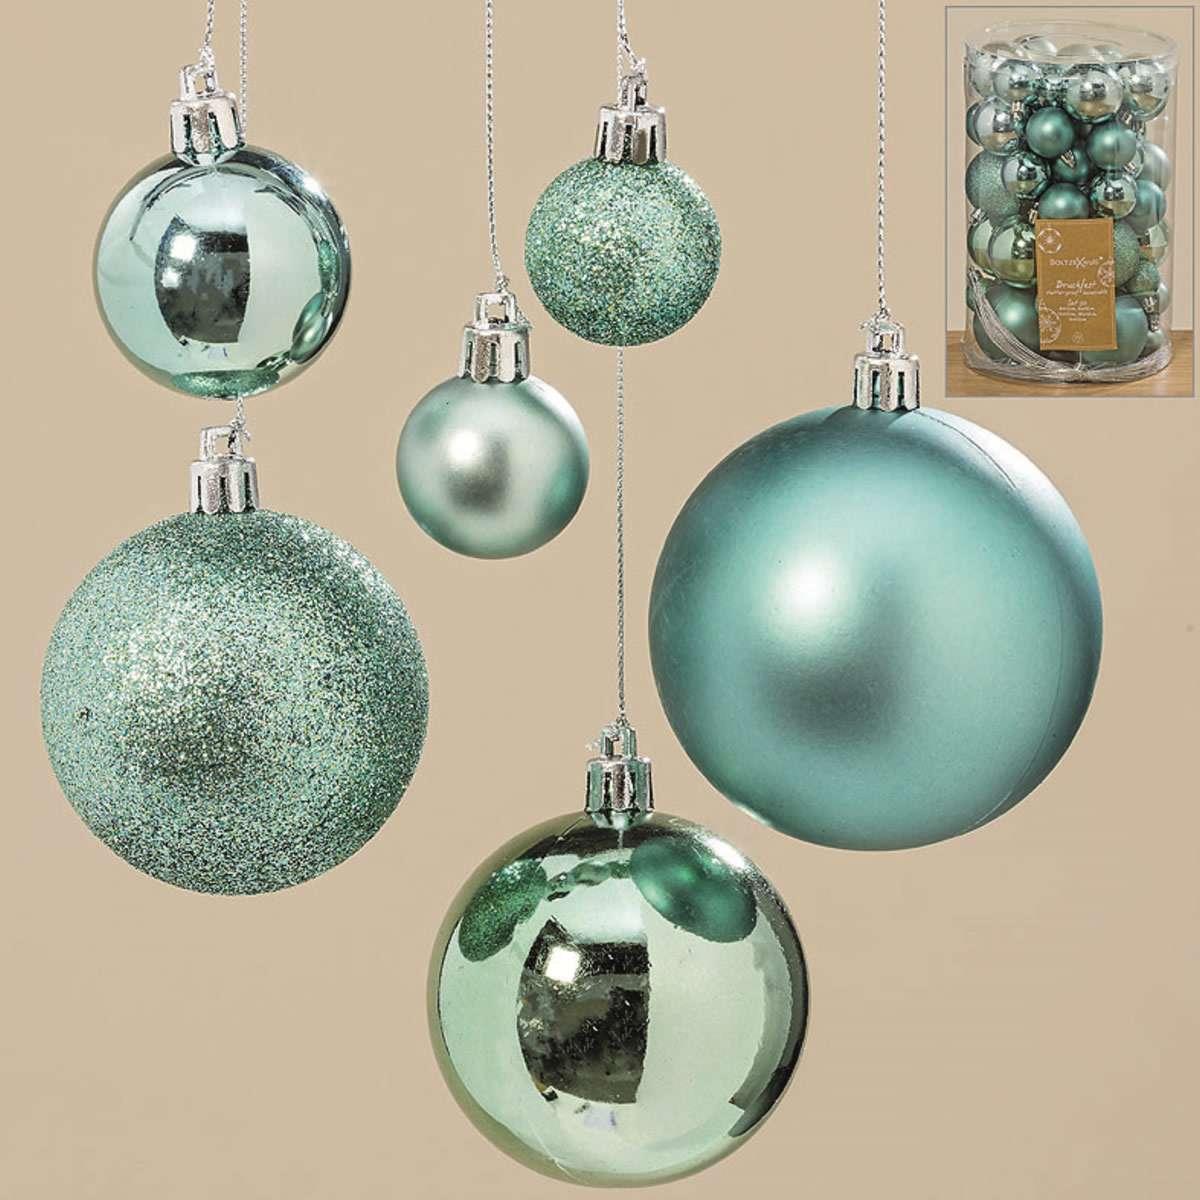 Christbaumkugeln Türkis Kunststoff.50 Design Kunststoff Weihnachtskugeln 3 7cm Grün Bamkugel Dekokugel